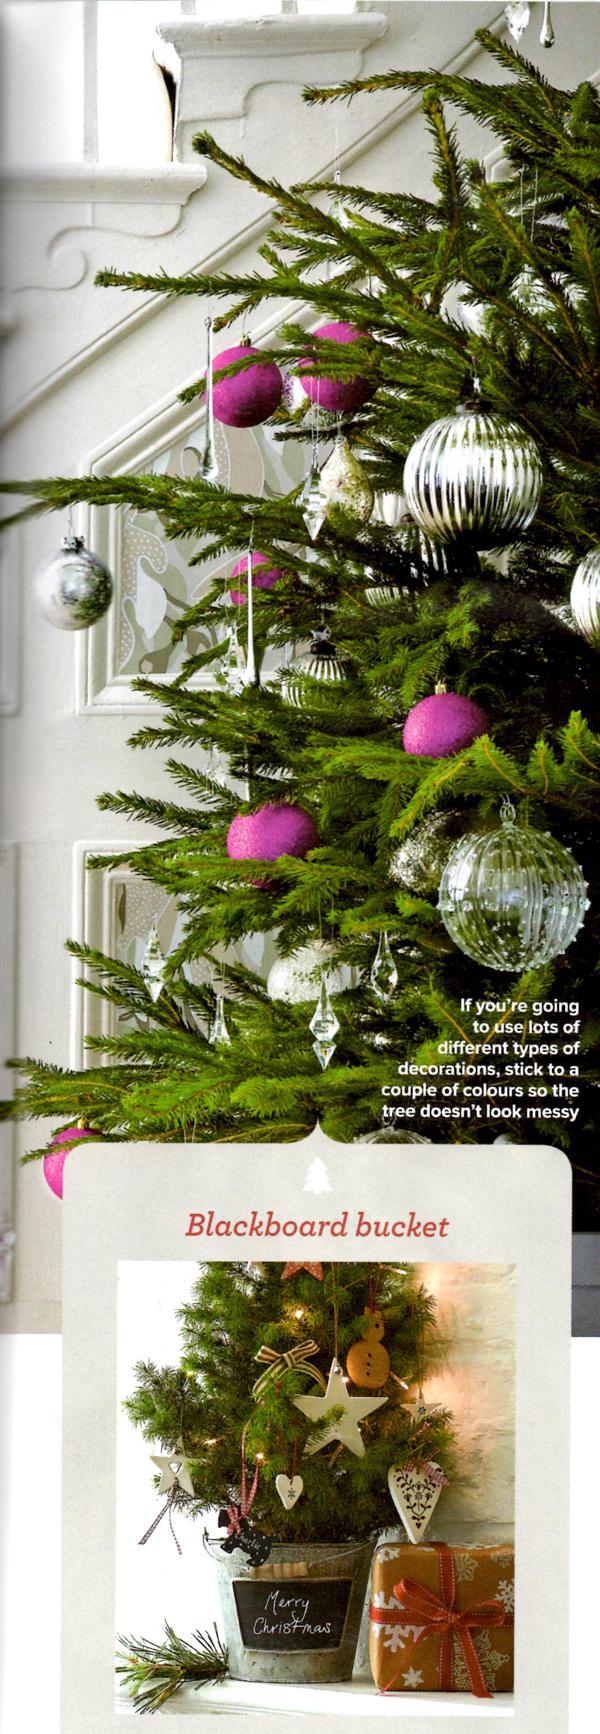 Christmas Tree Blackboard Bucket